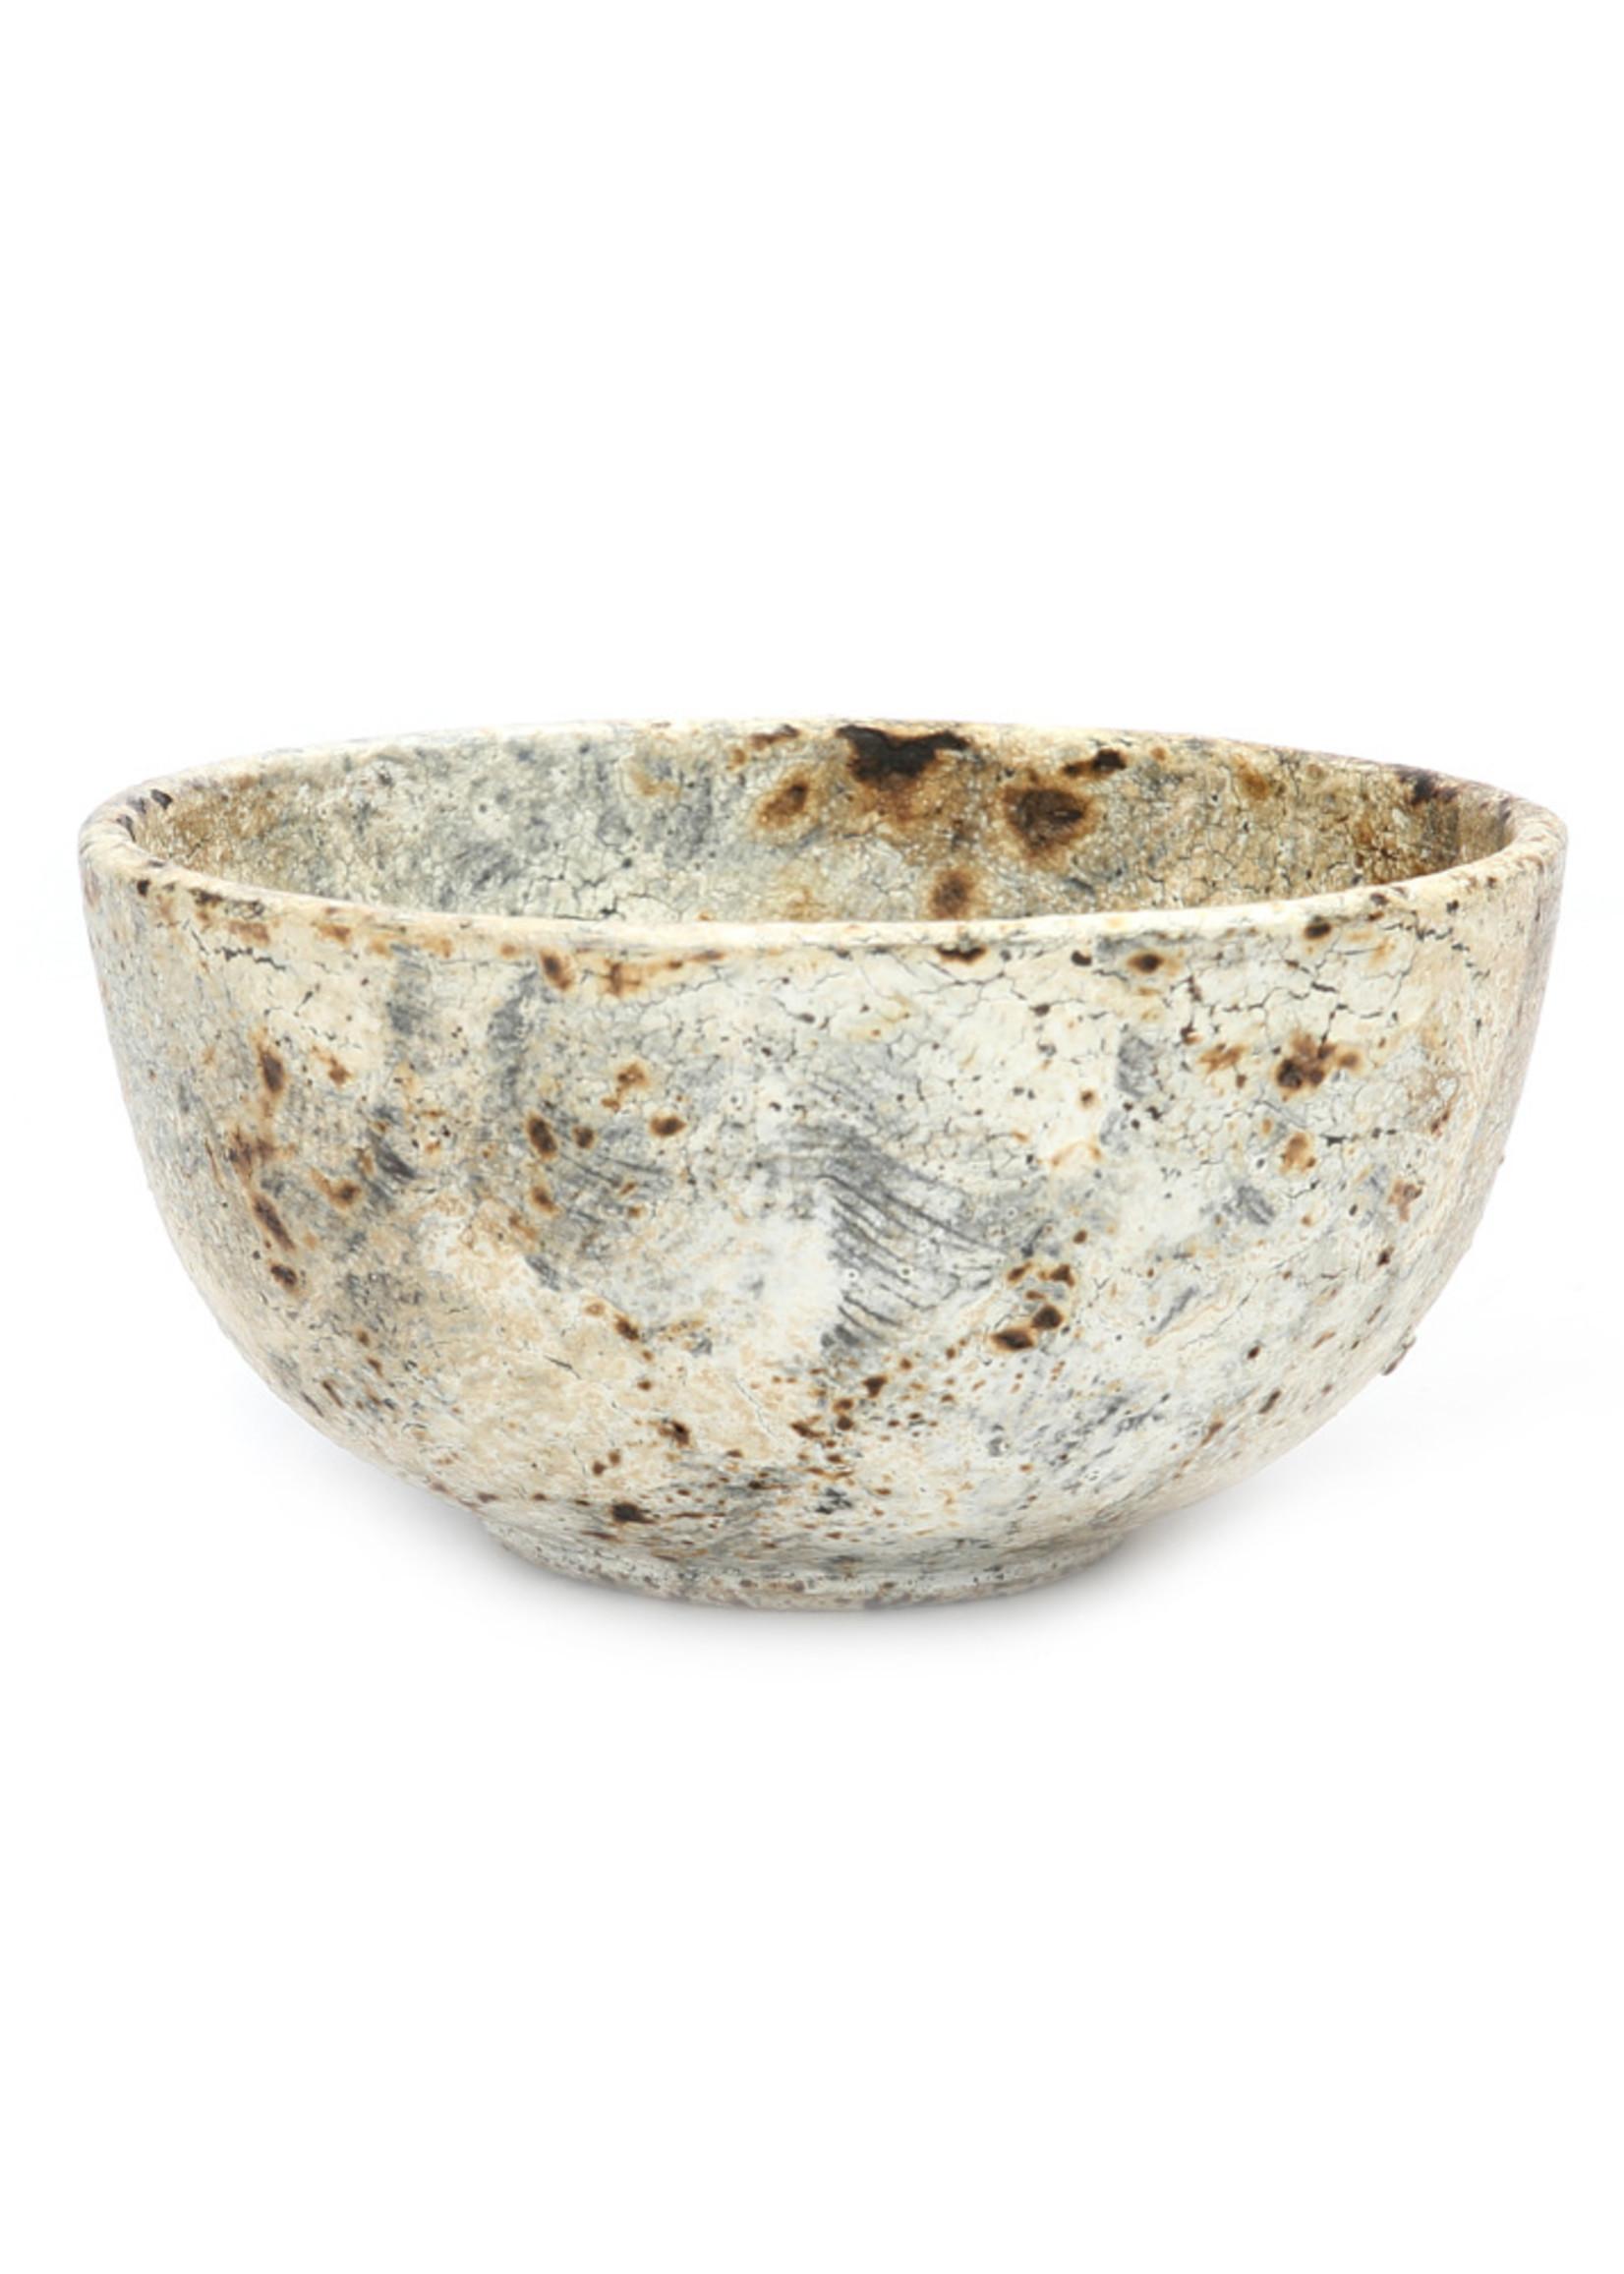 The Burned Bowl - Antique - M